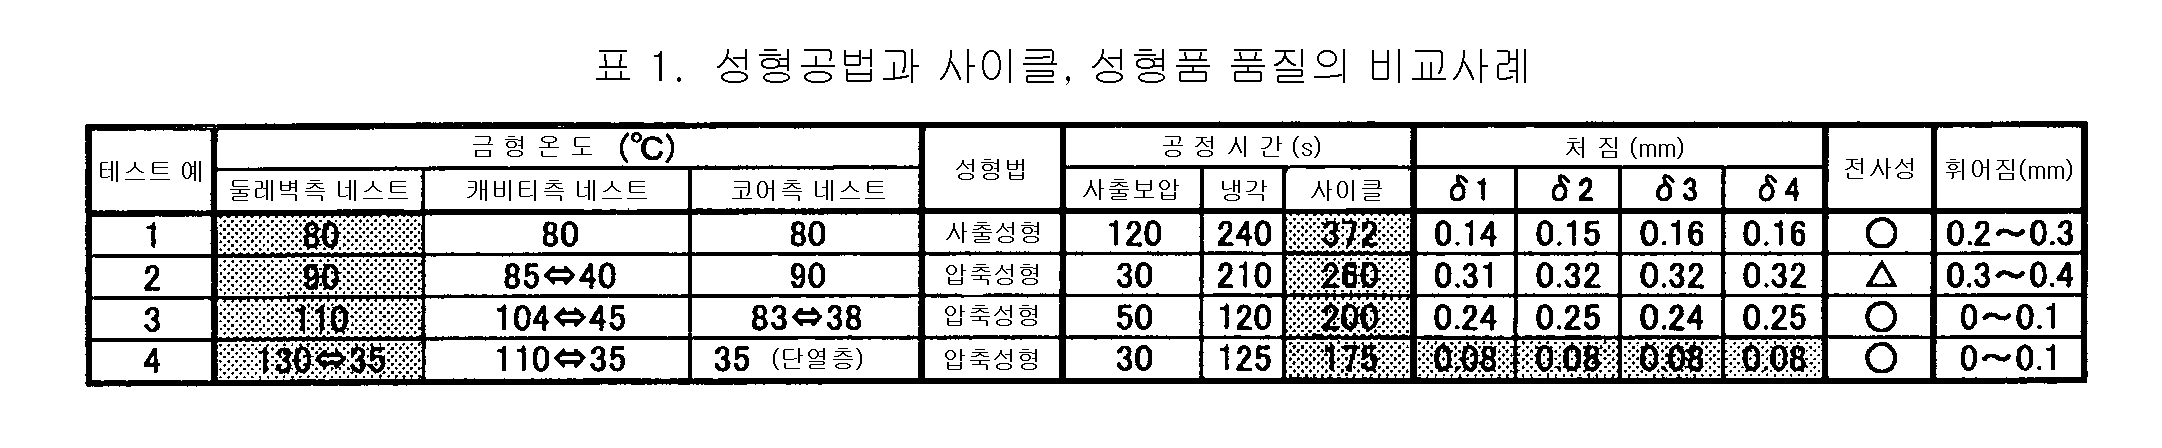 Figure 112005030180203-pat00001